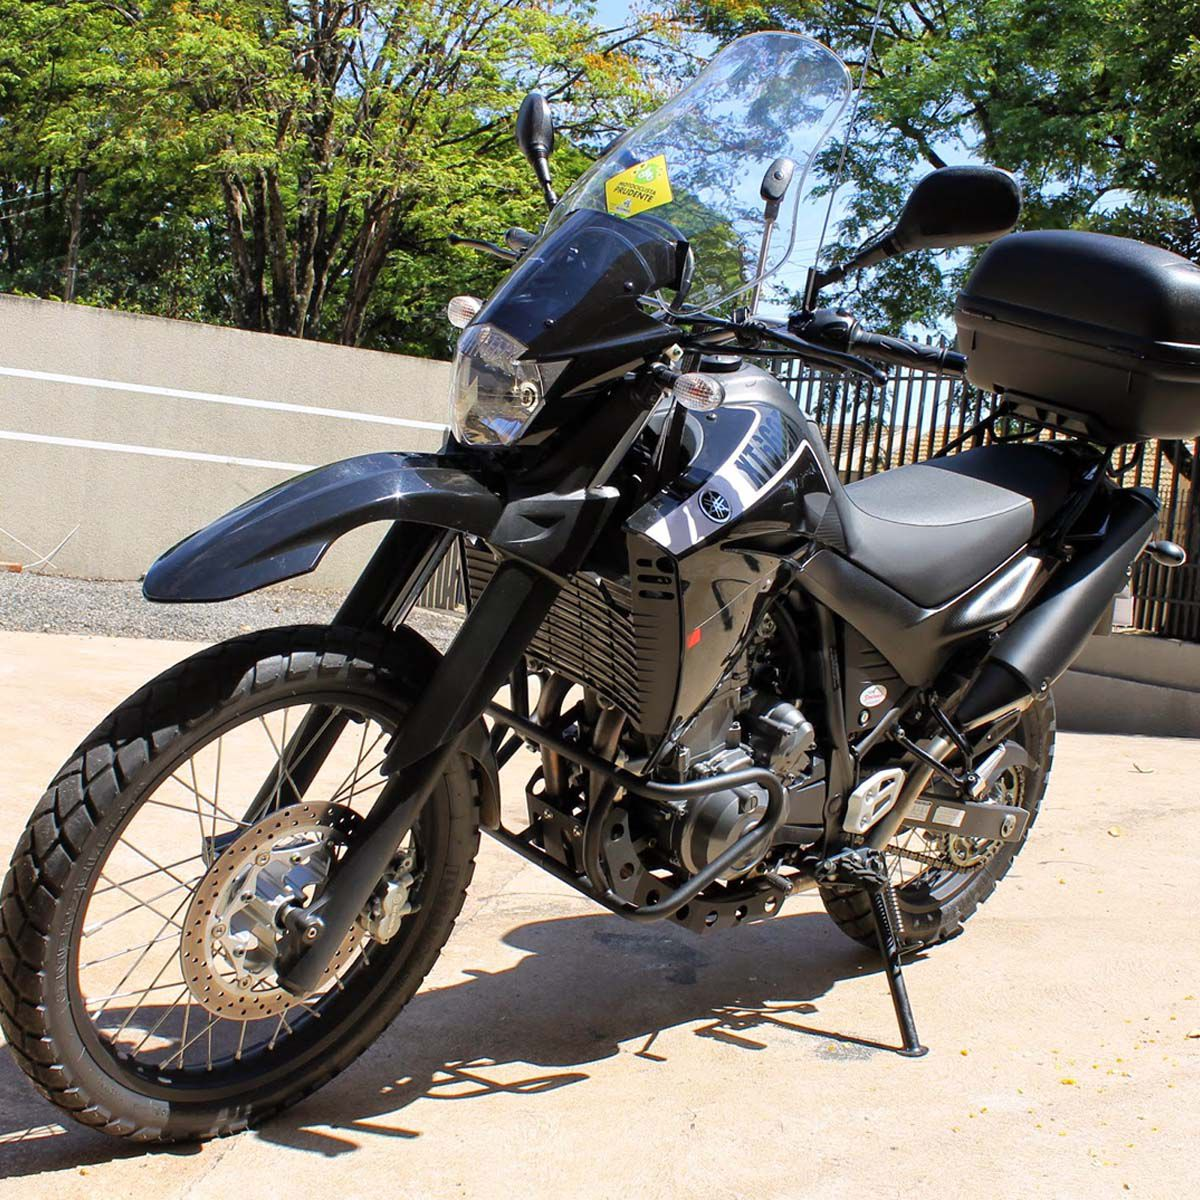 Protetor de Carter Coyote Preto - XT 660 R - Yamaha